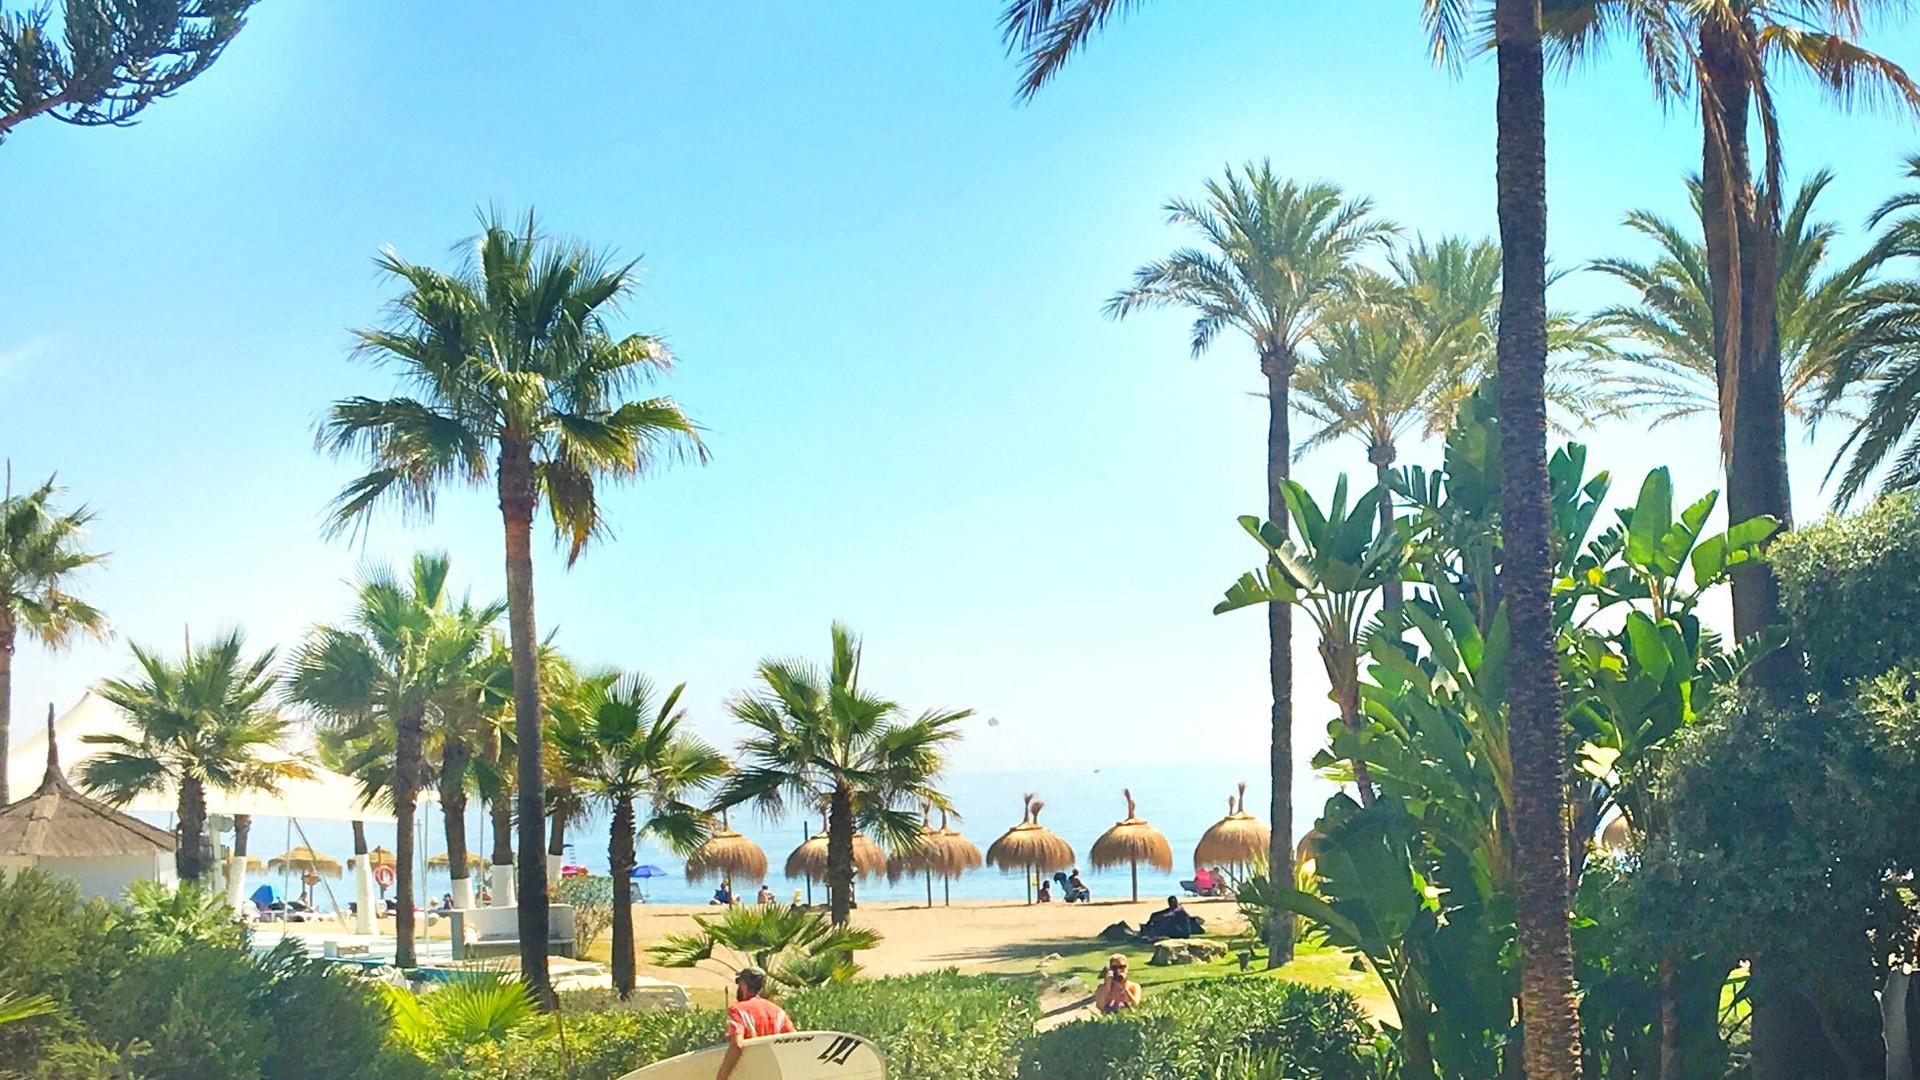 38 Degrees North Marbella